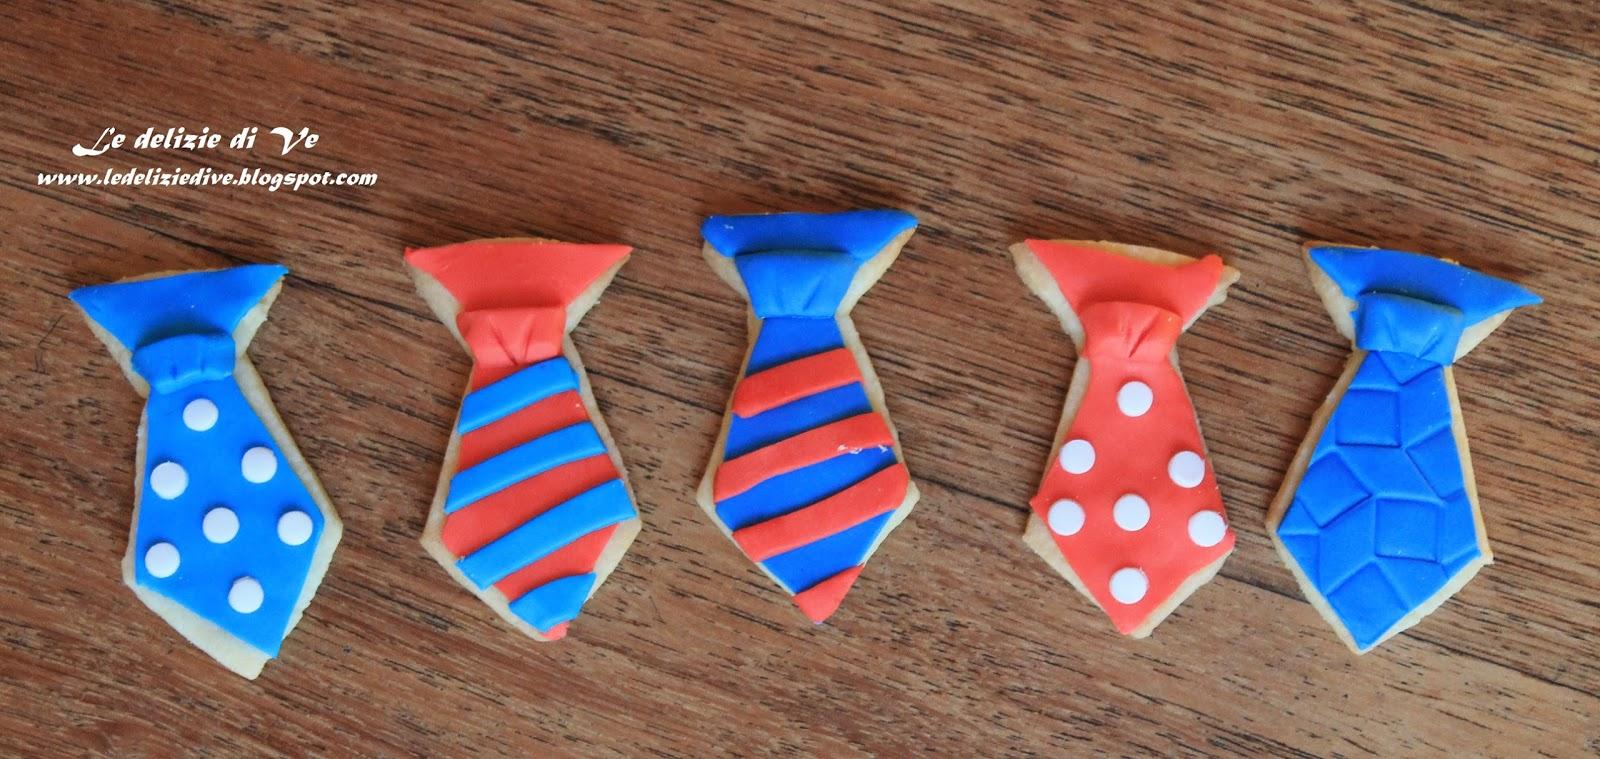 Le delizie di ve festa del papa cookies